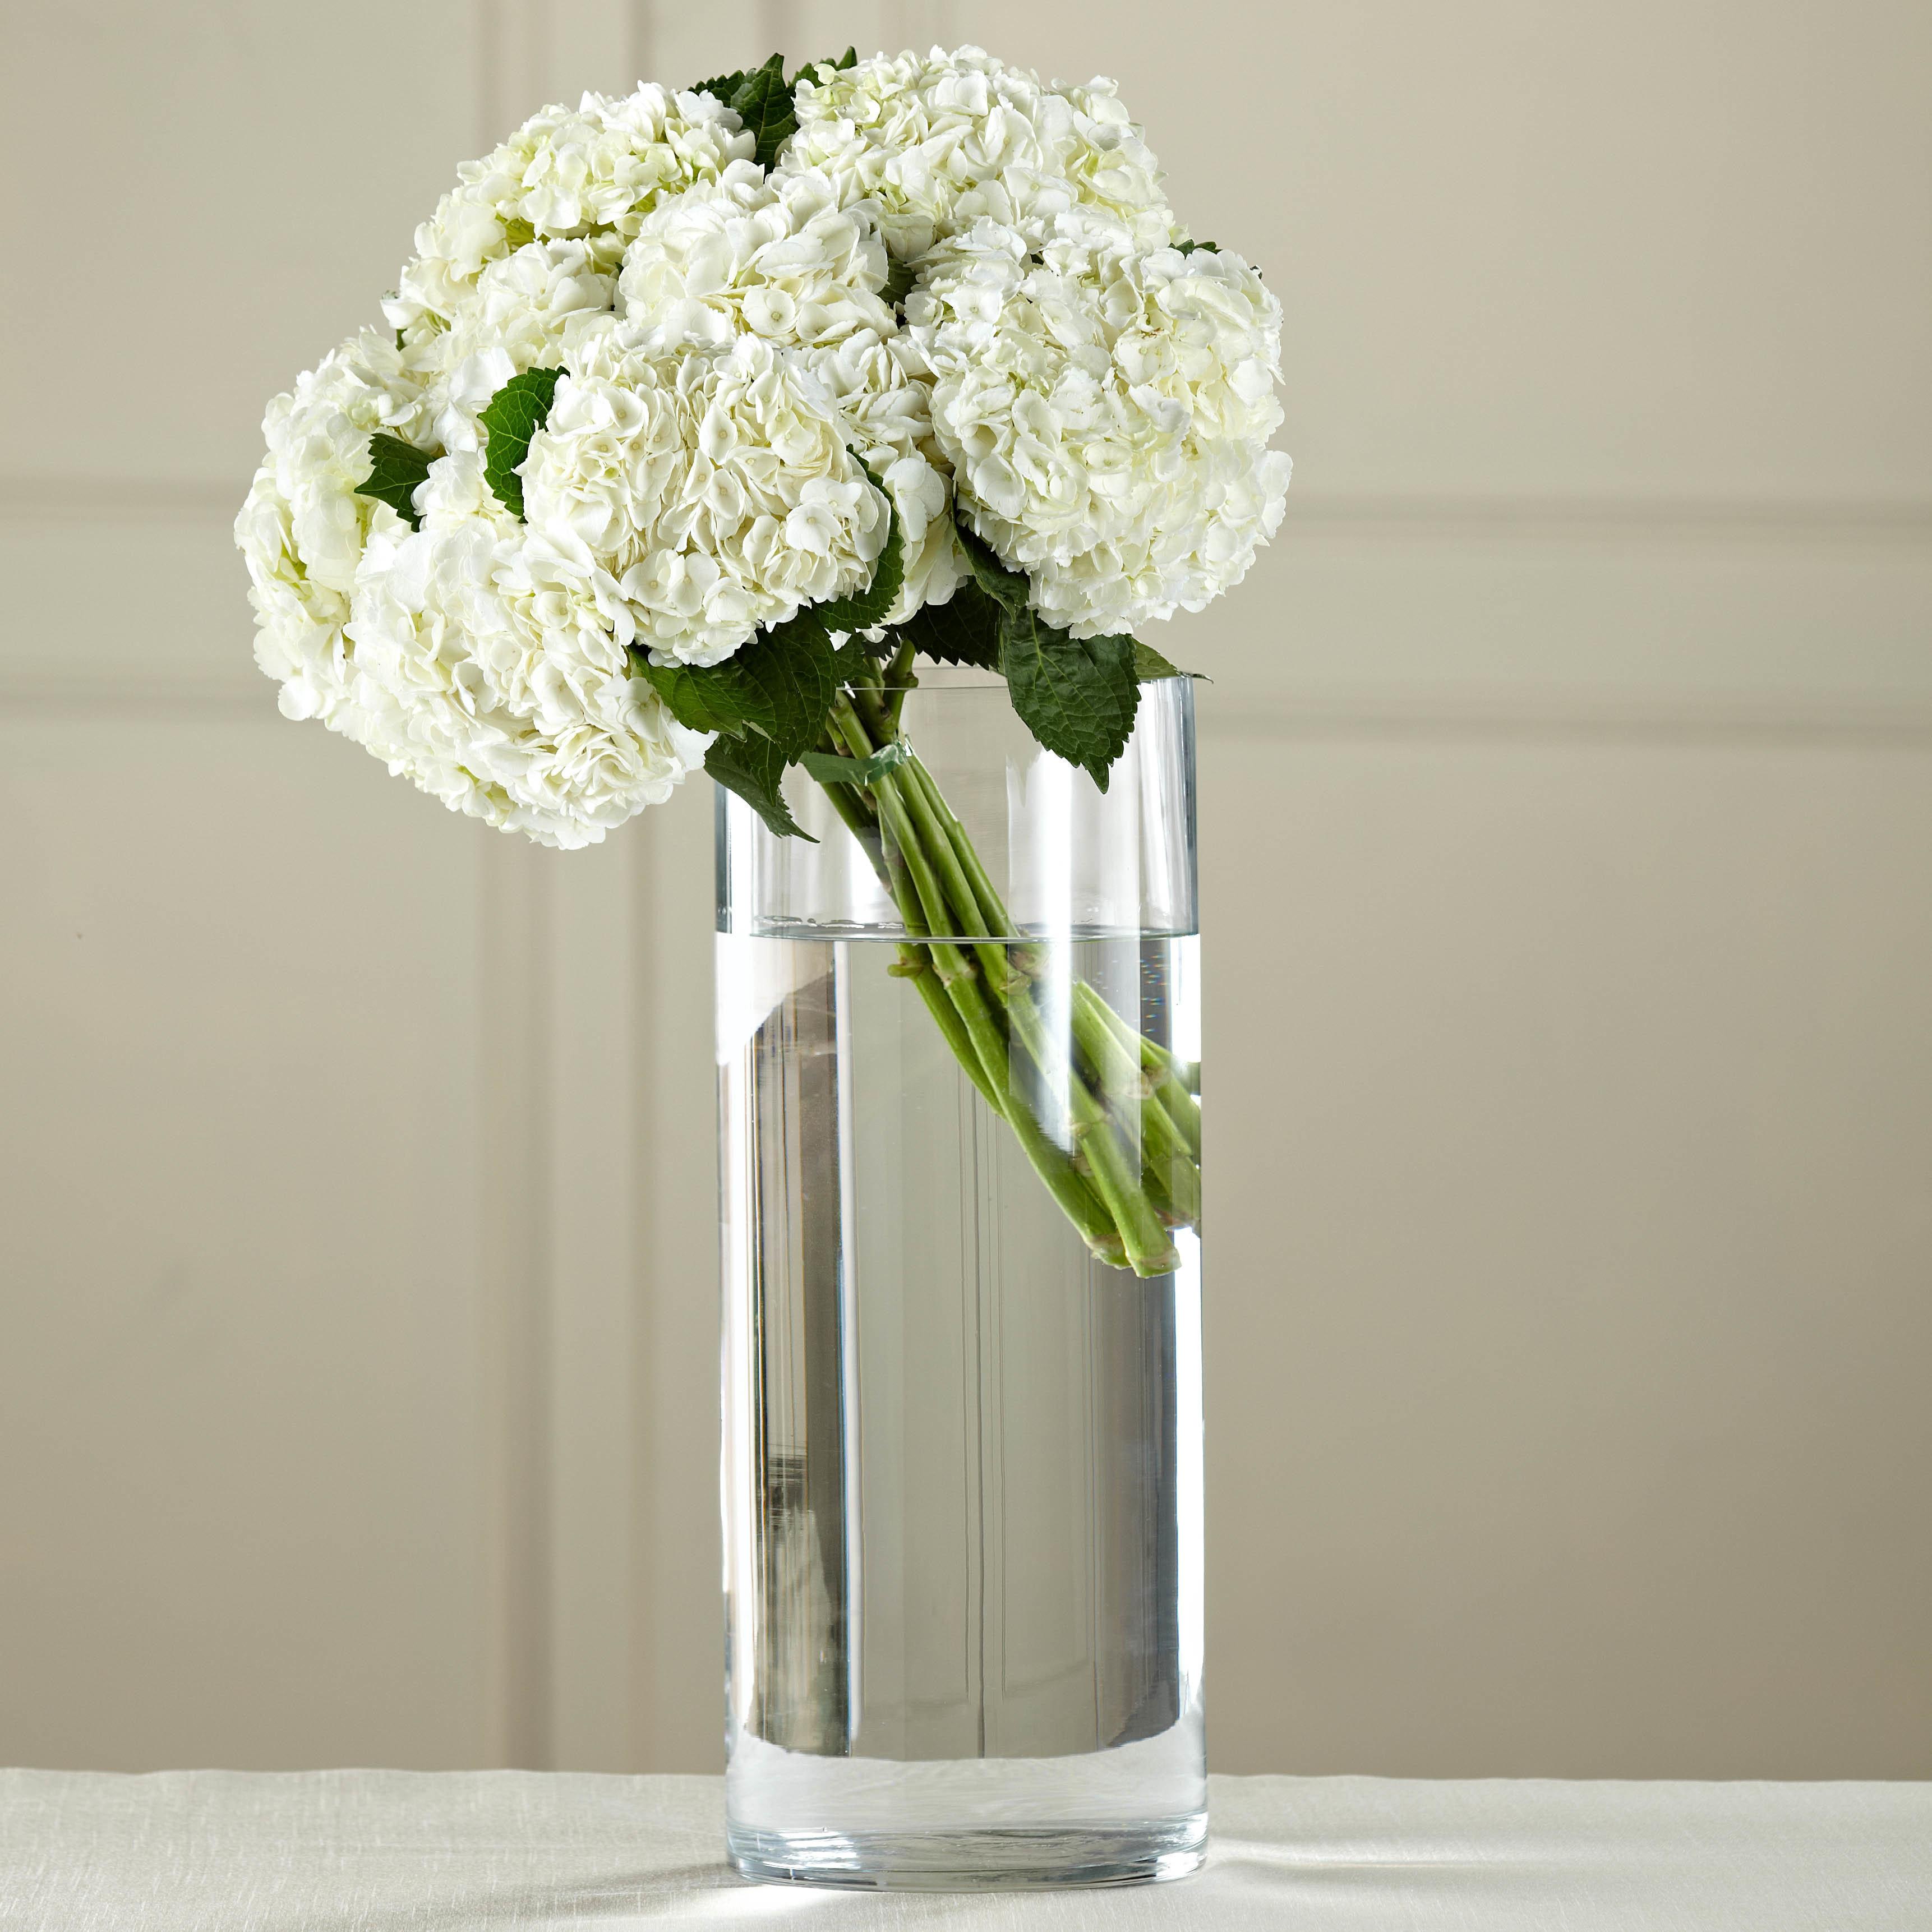 The Ftd White Hydrangea Hand Tied Bouquet By Tognoli Fresh